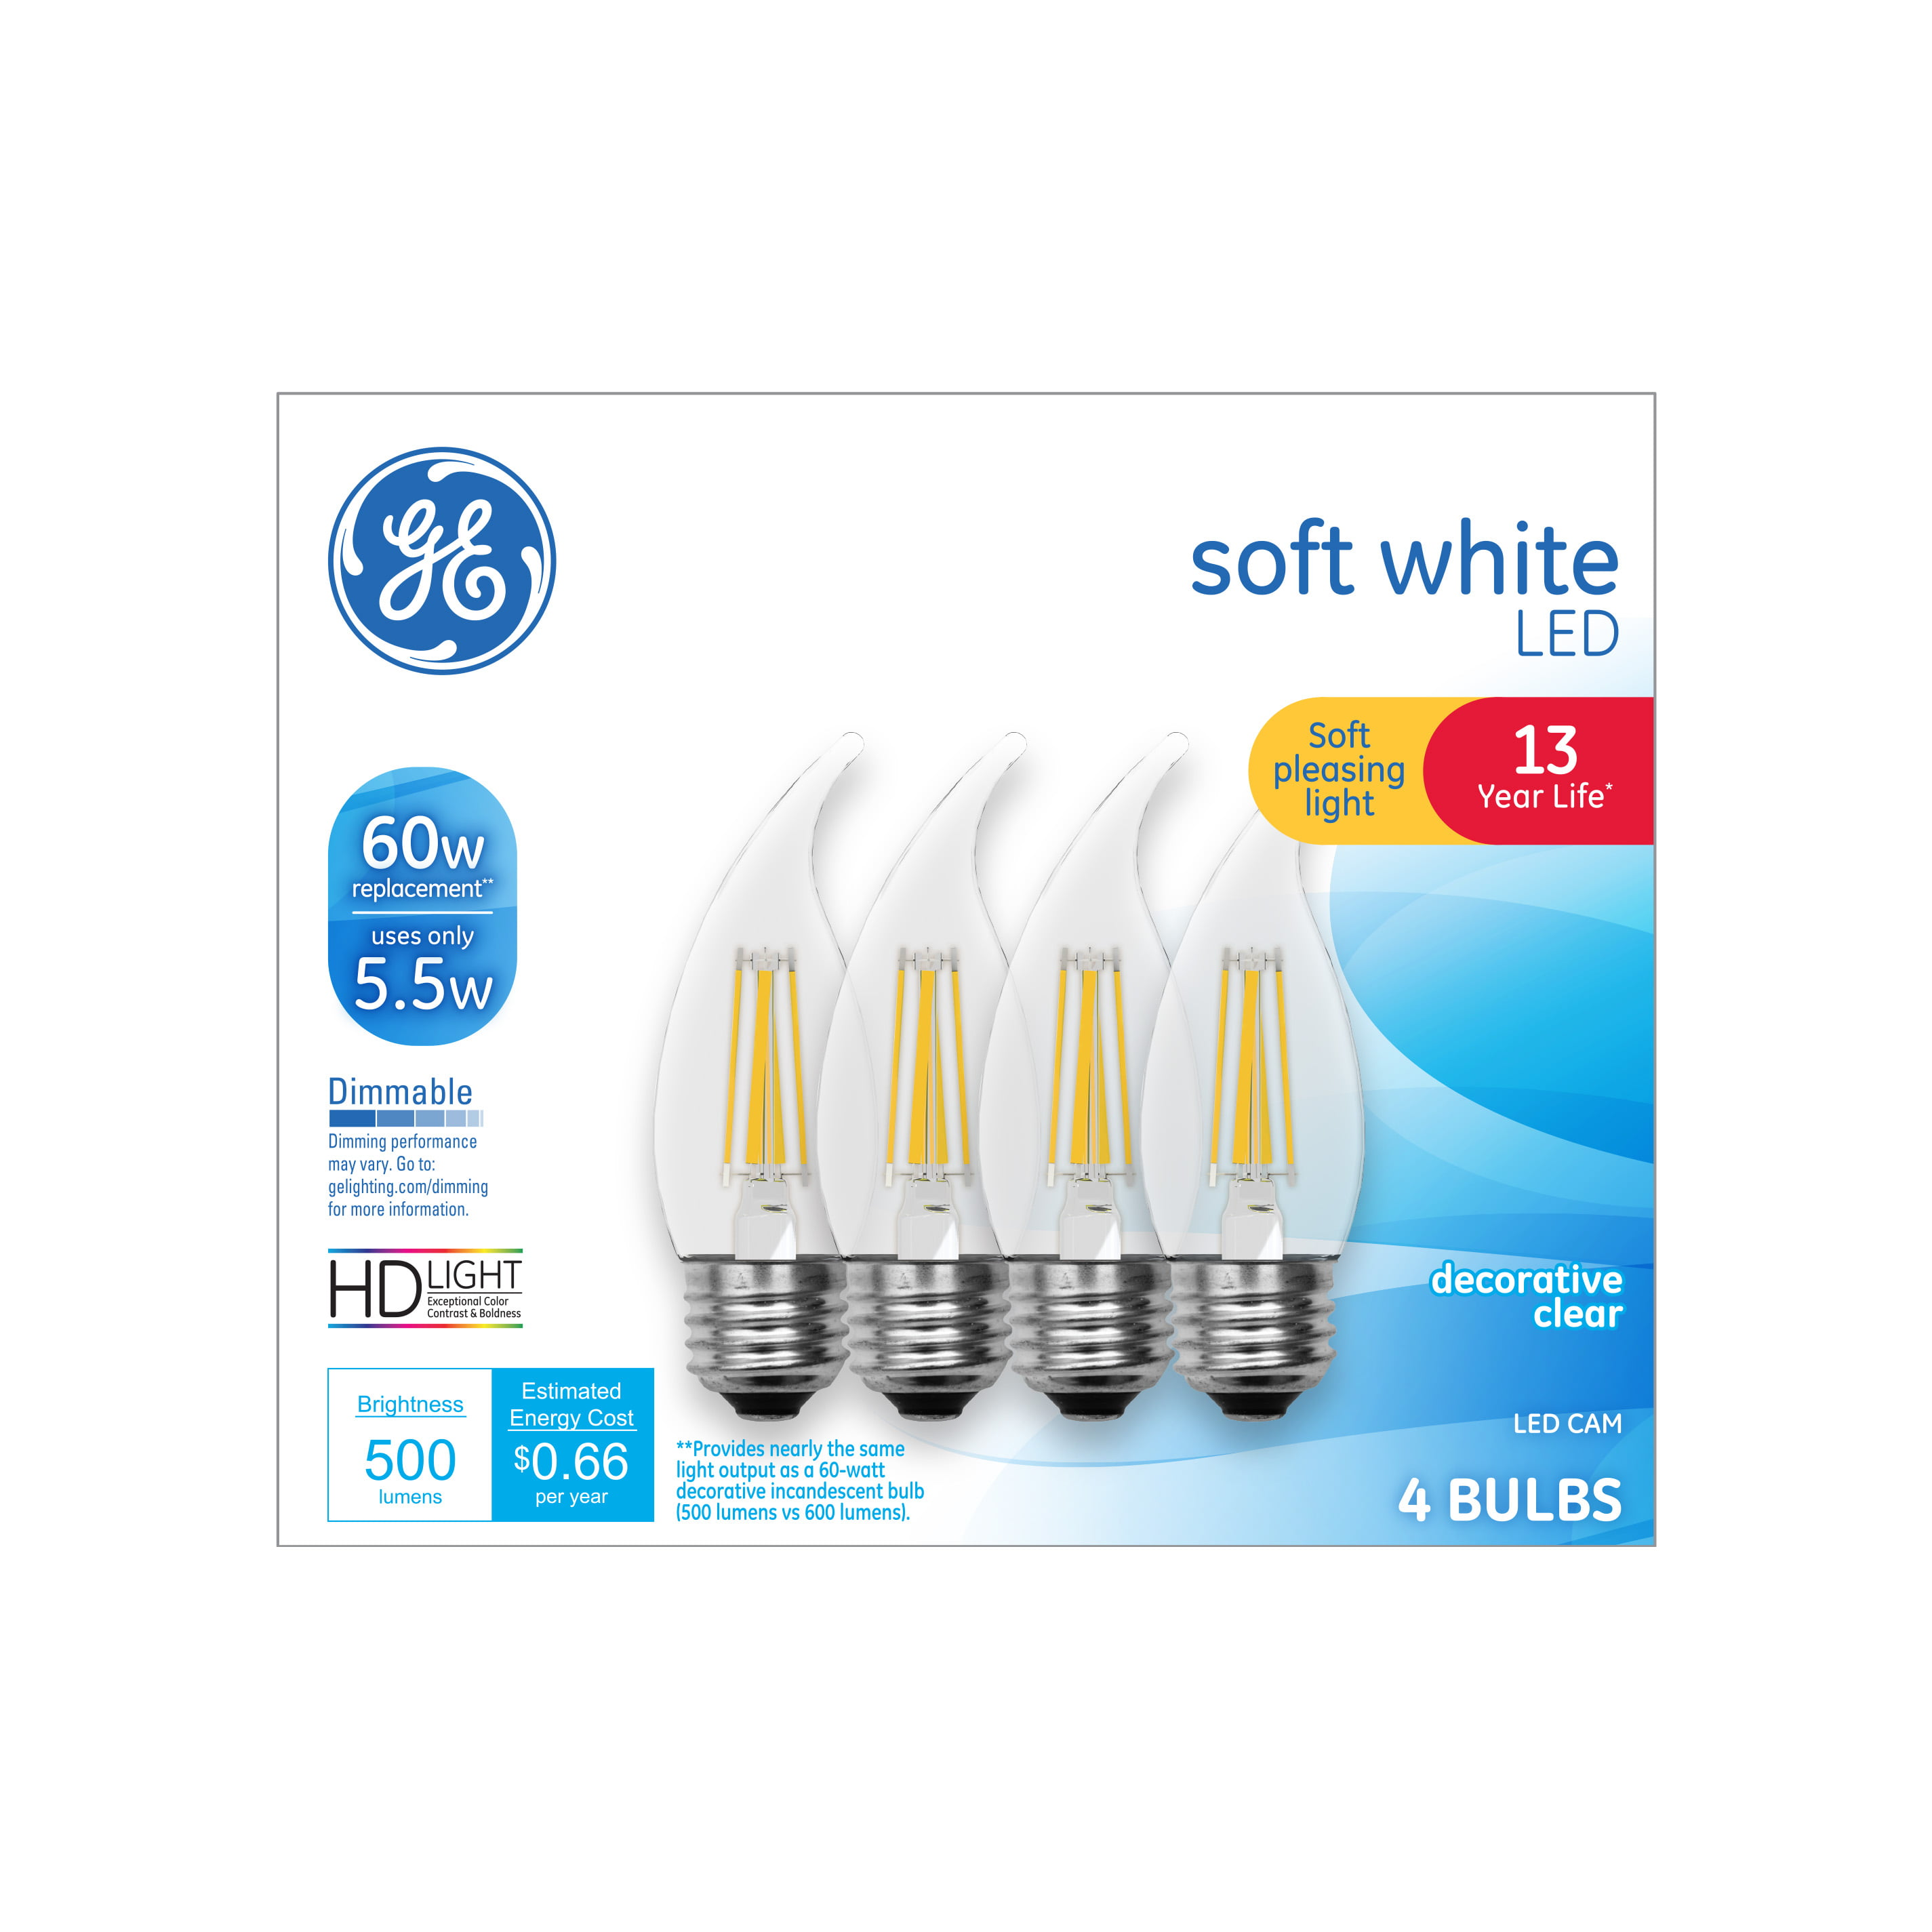 Ge Led 5 5w 60w Equivalent Hd Soft White Clear Decorative Light Bulbs Medium Base Dimmable 4pk Walmart Com Walmart Com